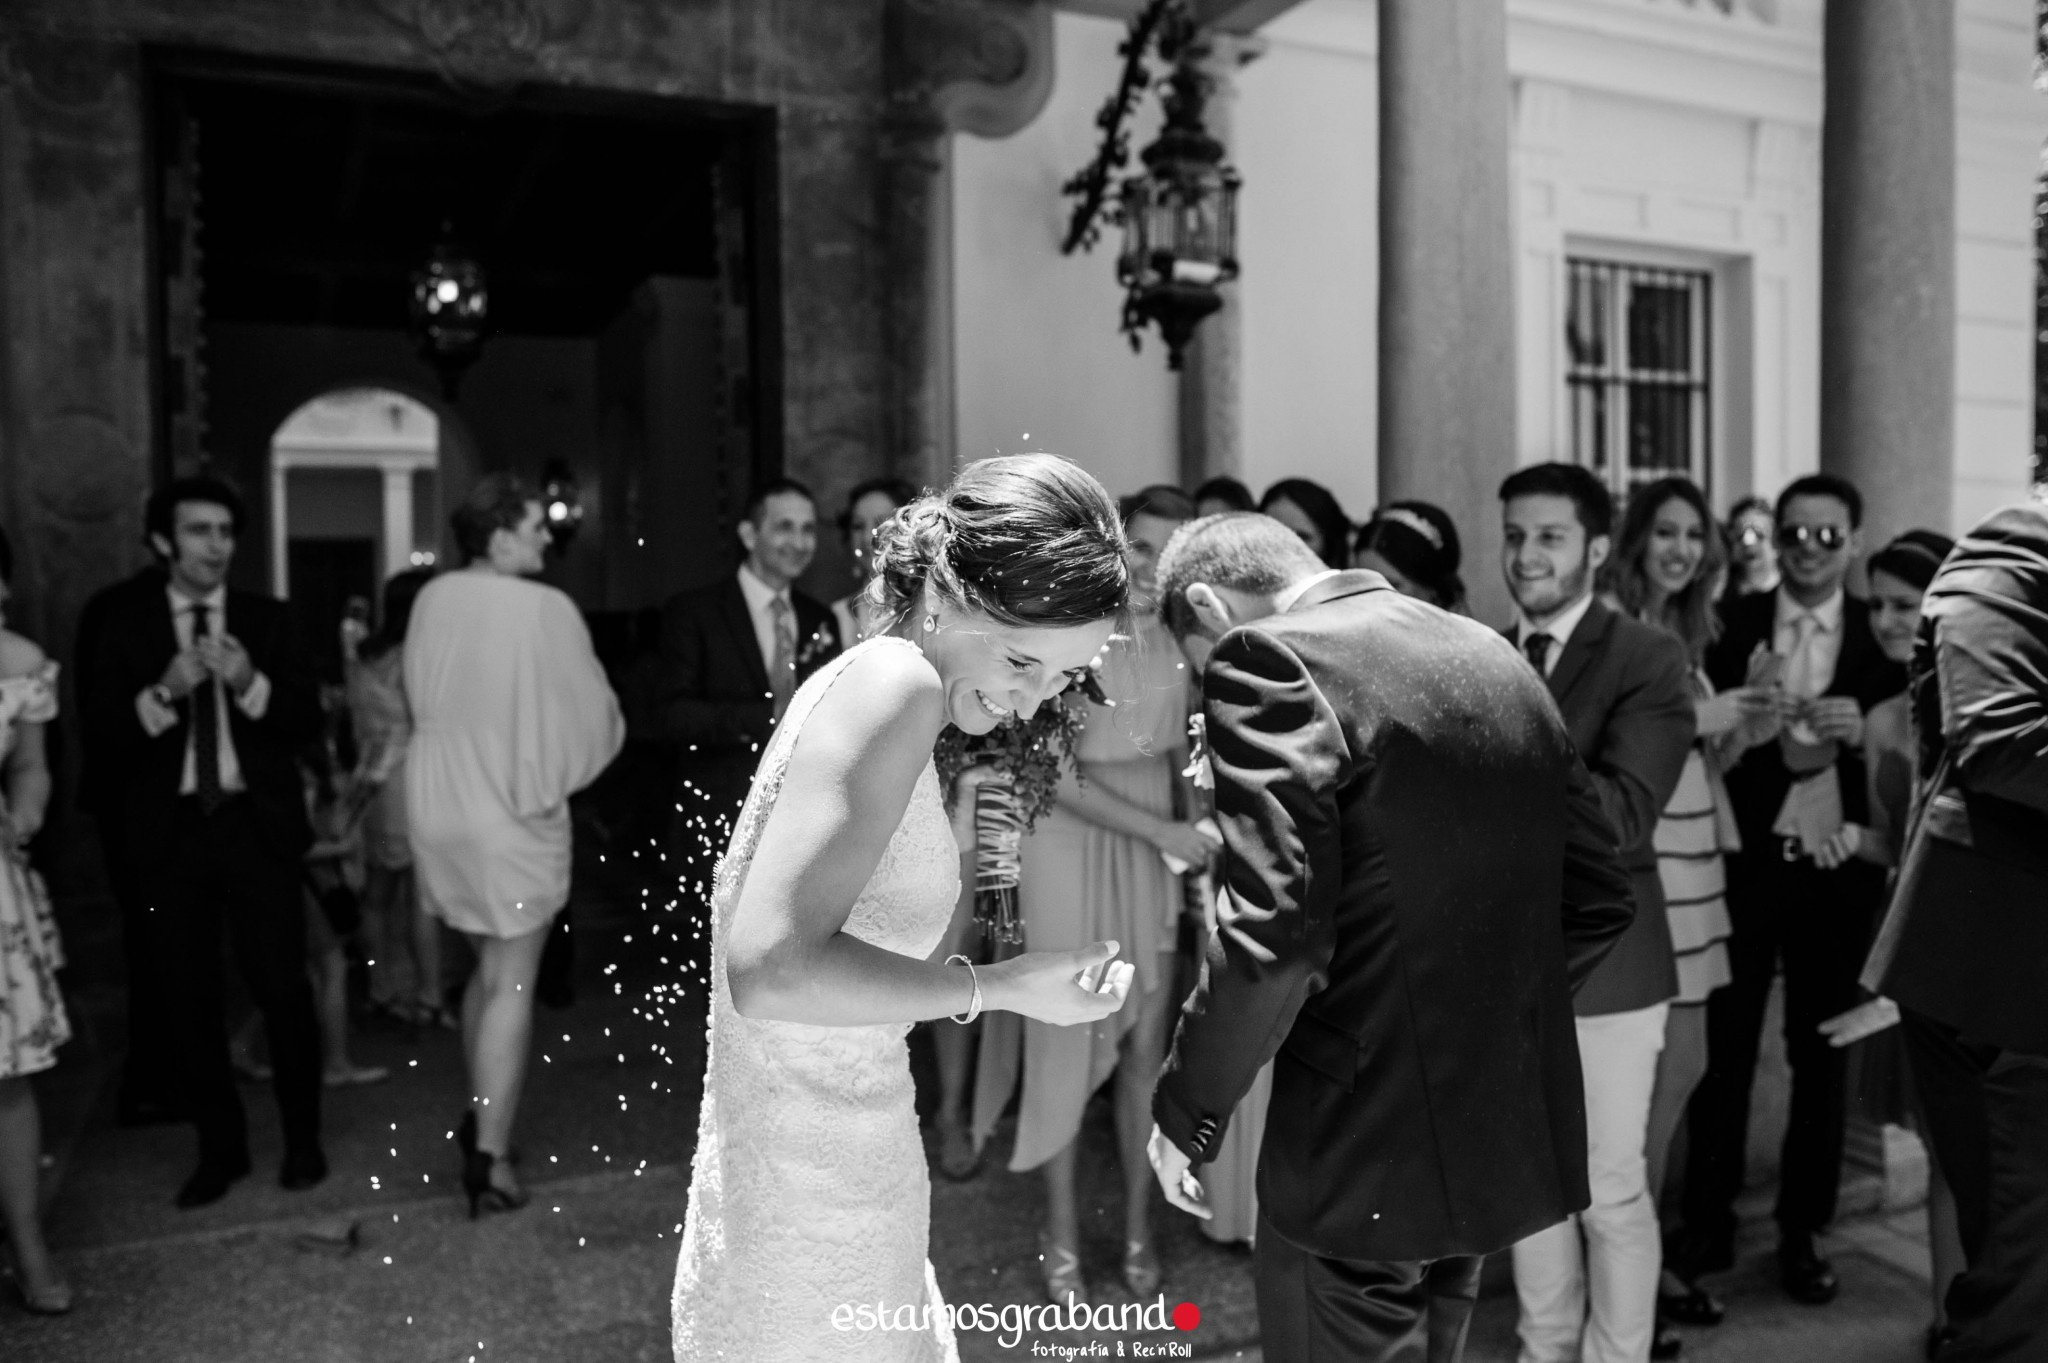 LEO-Y-PEDRO-38 Fotografía de Boda_Leo & Pedro [Jardines de la Mamunia, Granada] - video boda cadiz